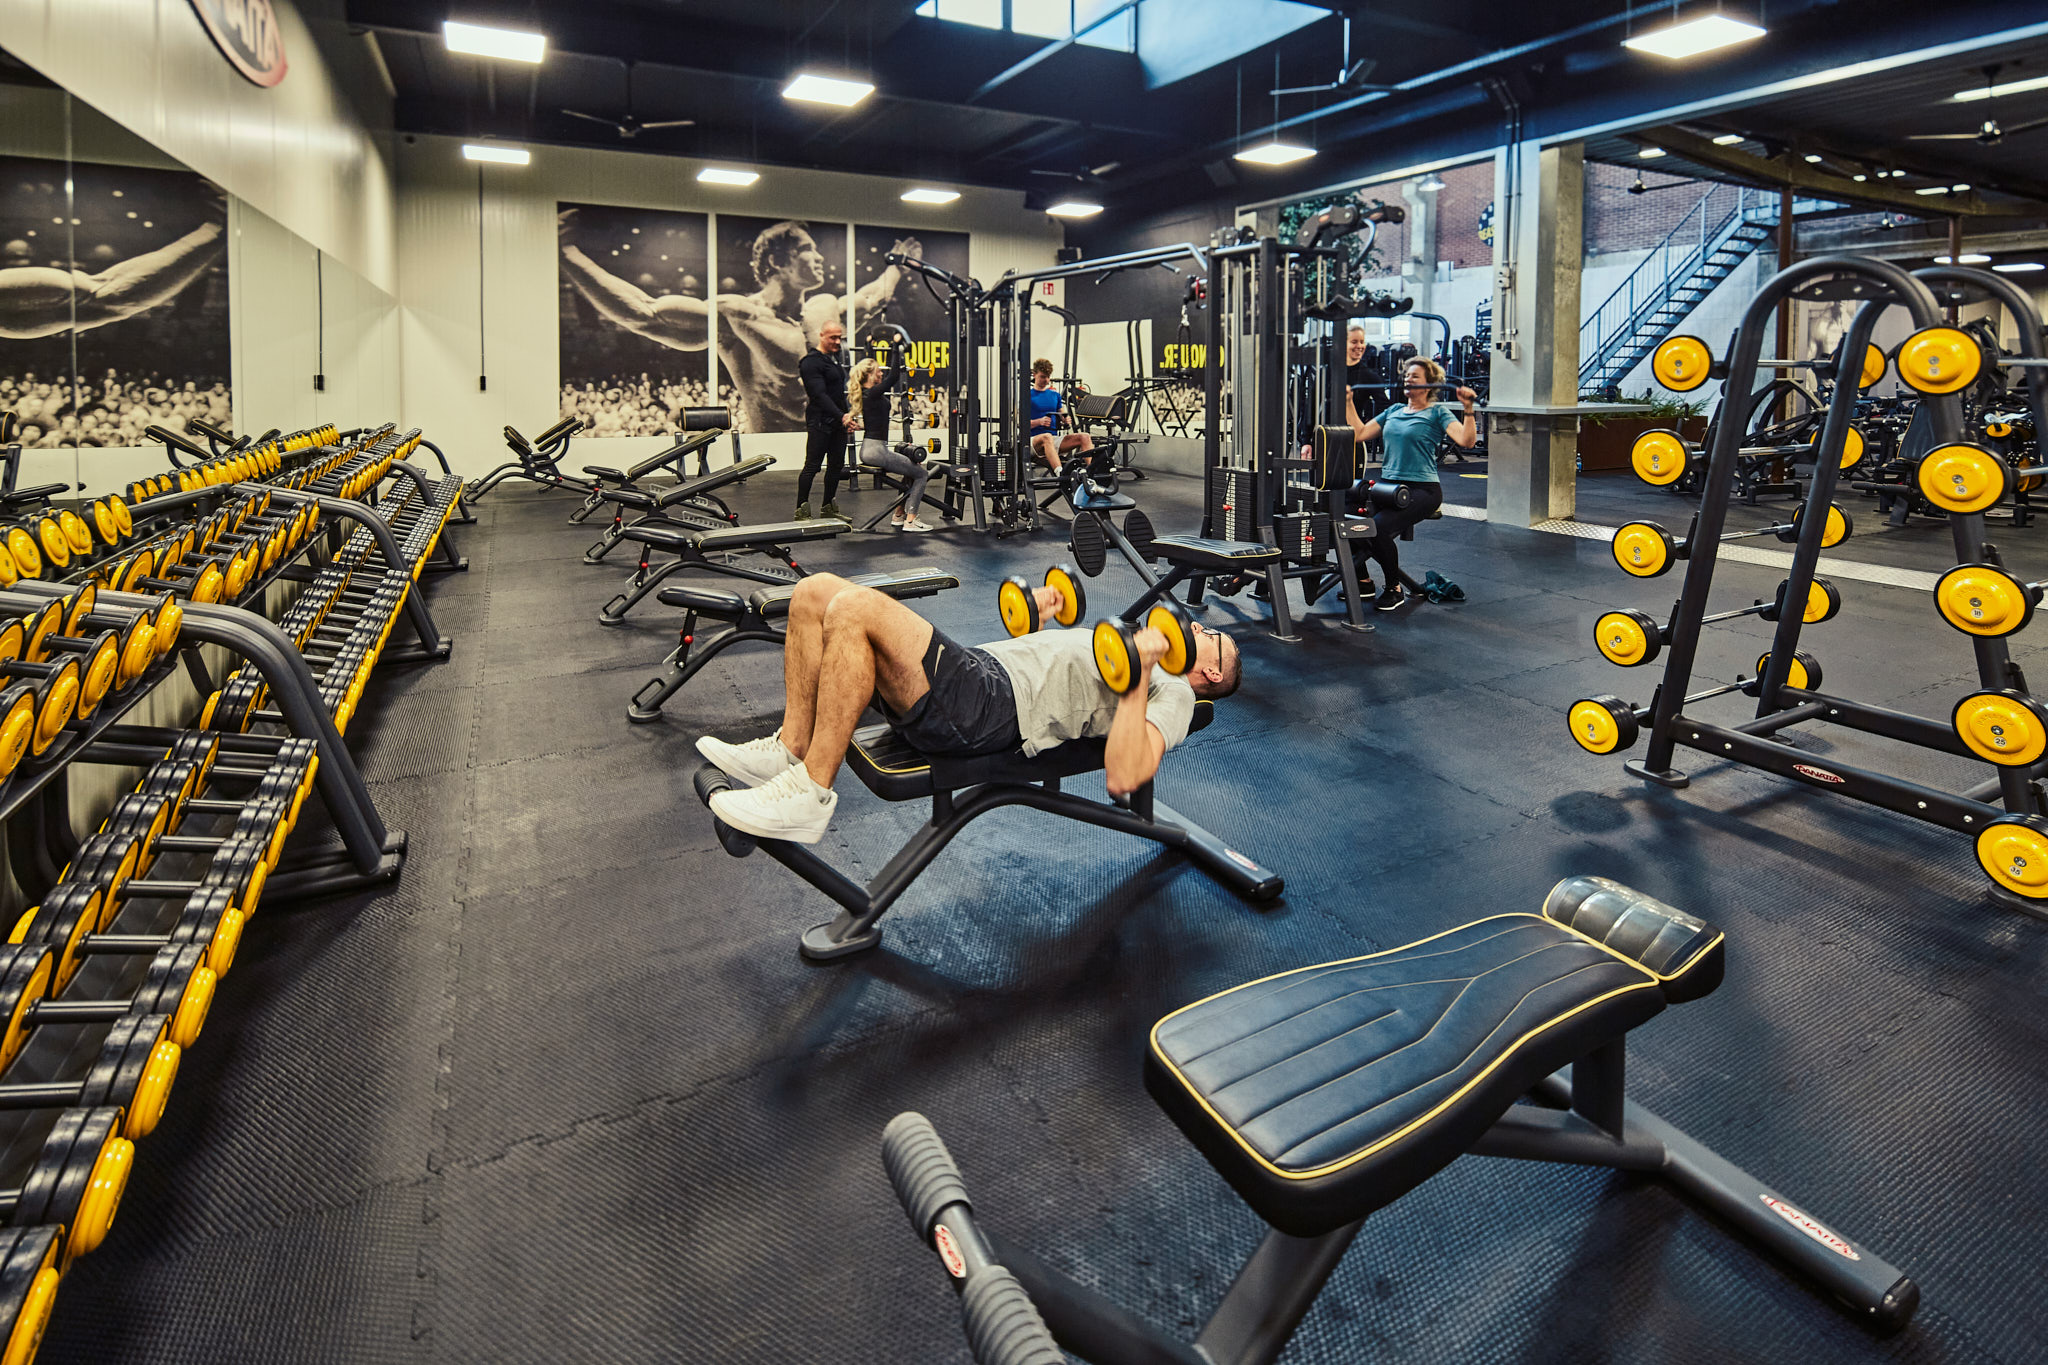 De Fitness Fabriek